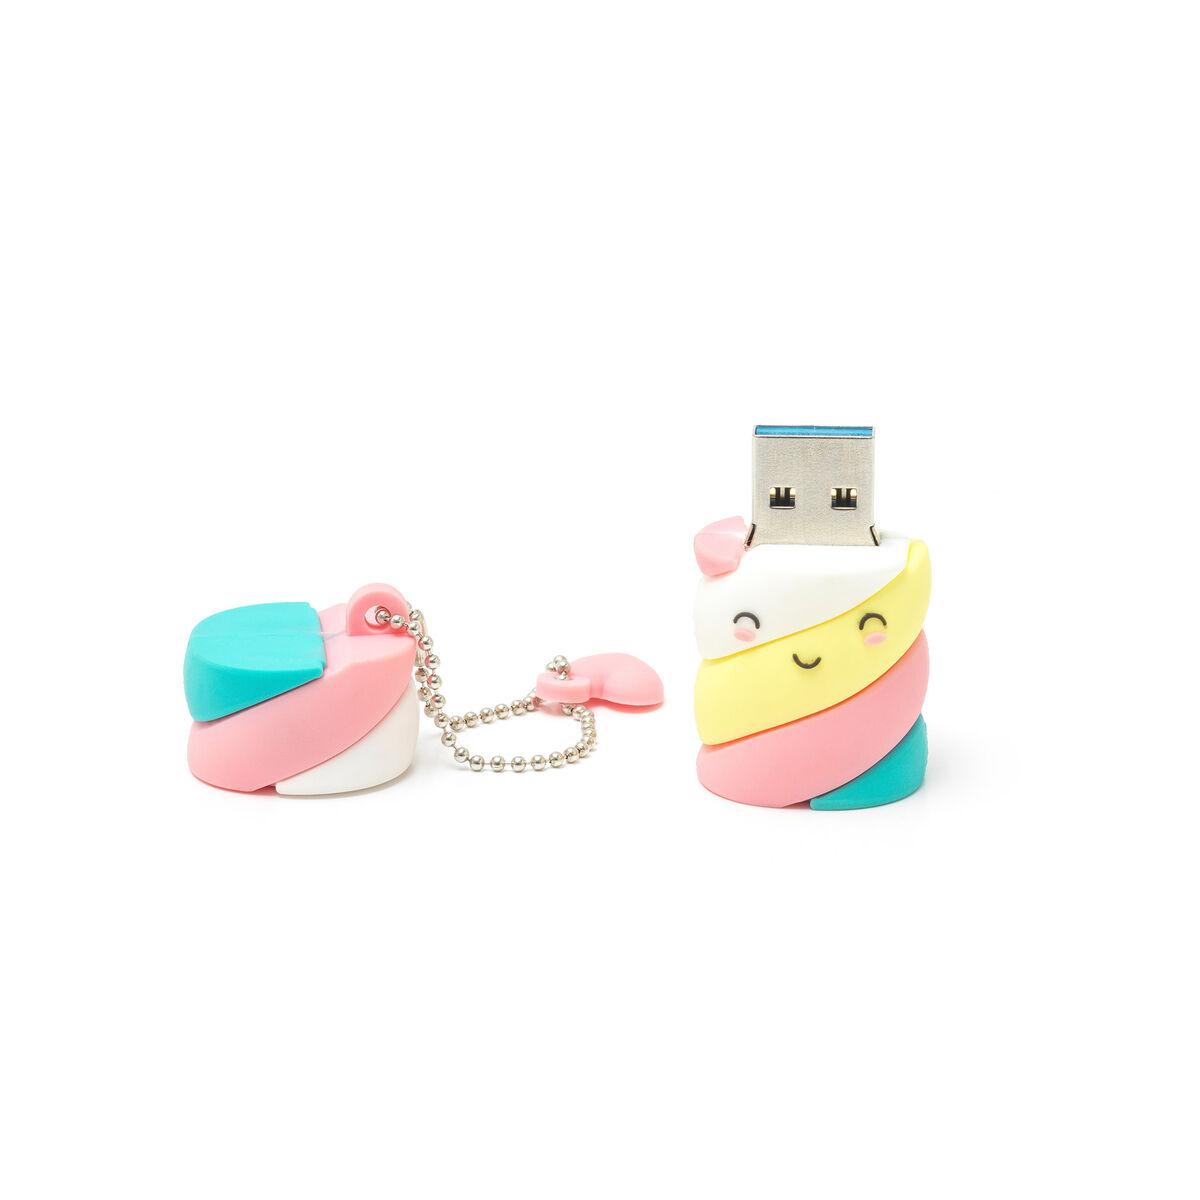 Chiavetta USB 3.0 - 16 GB, , zoo